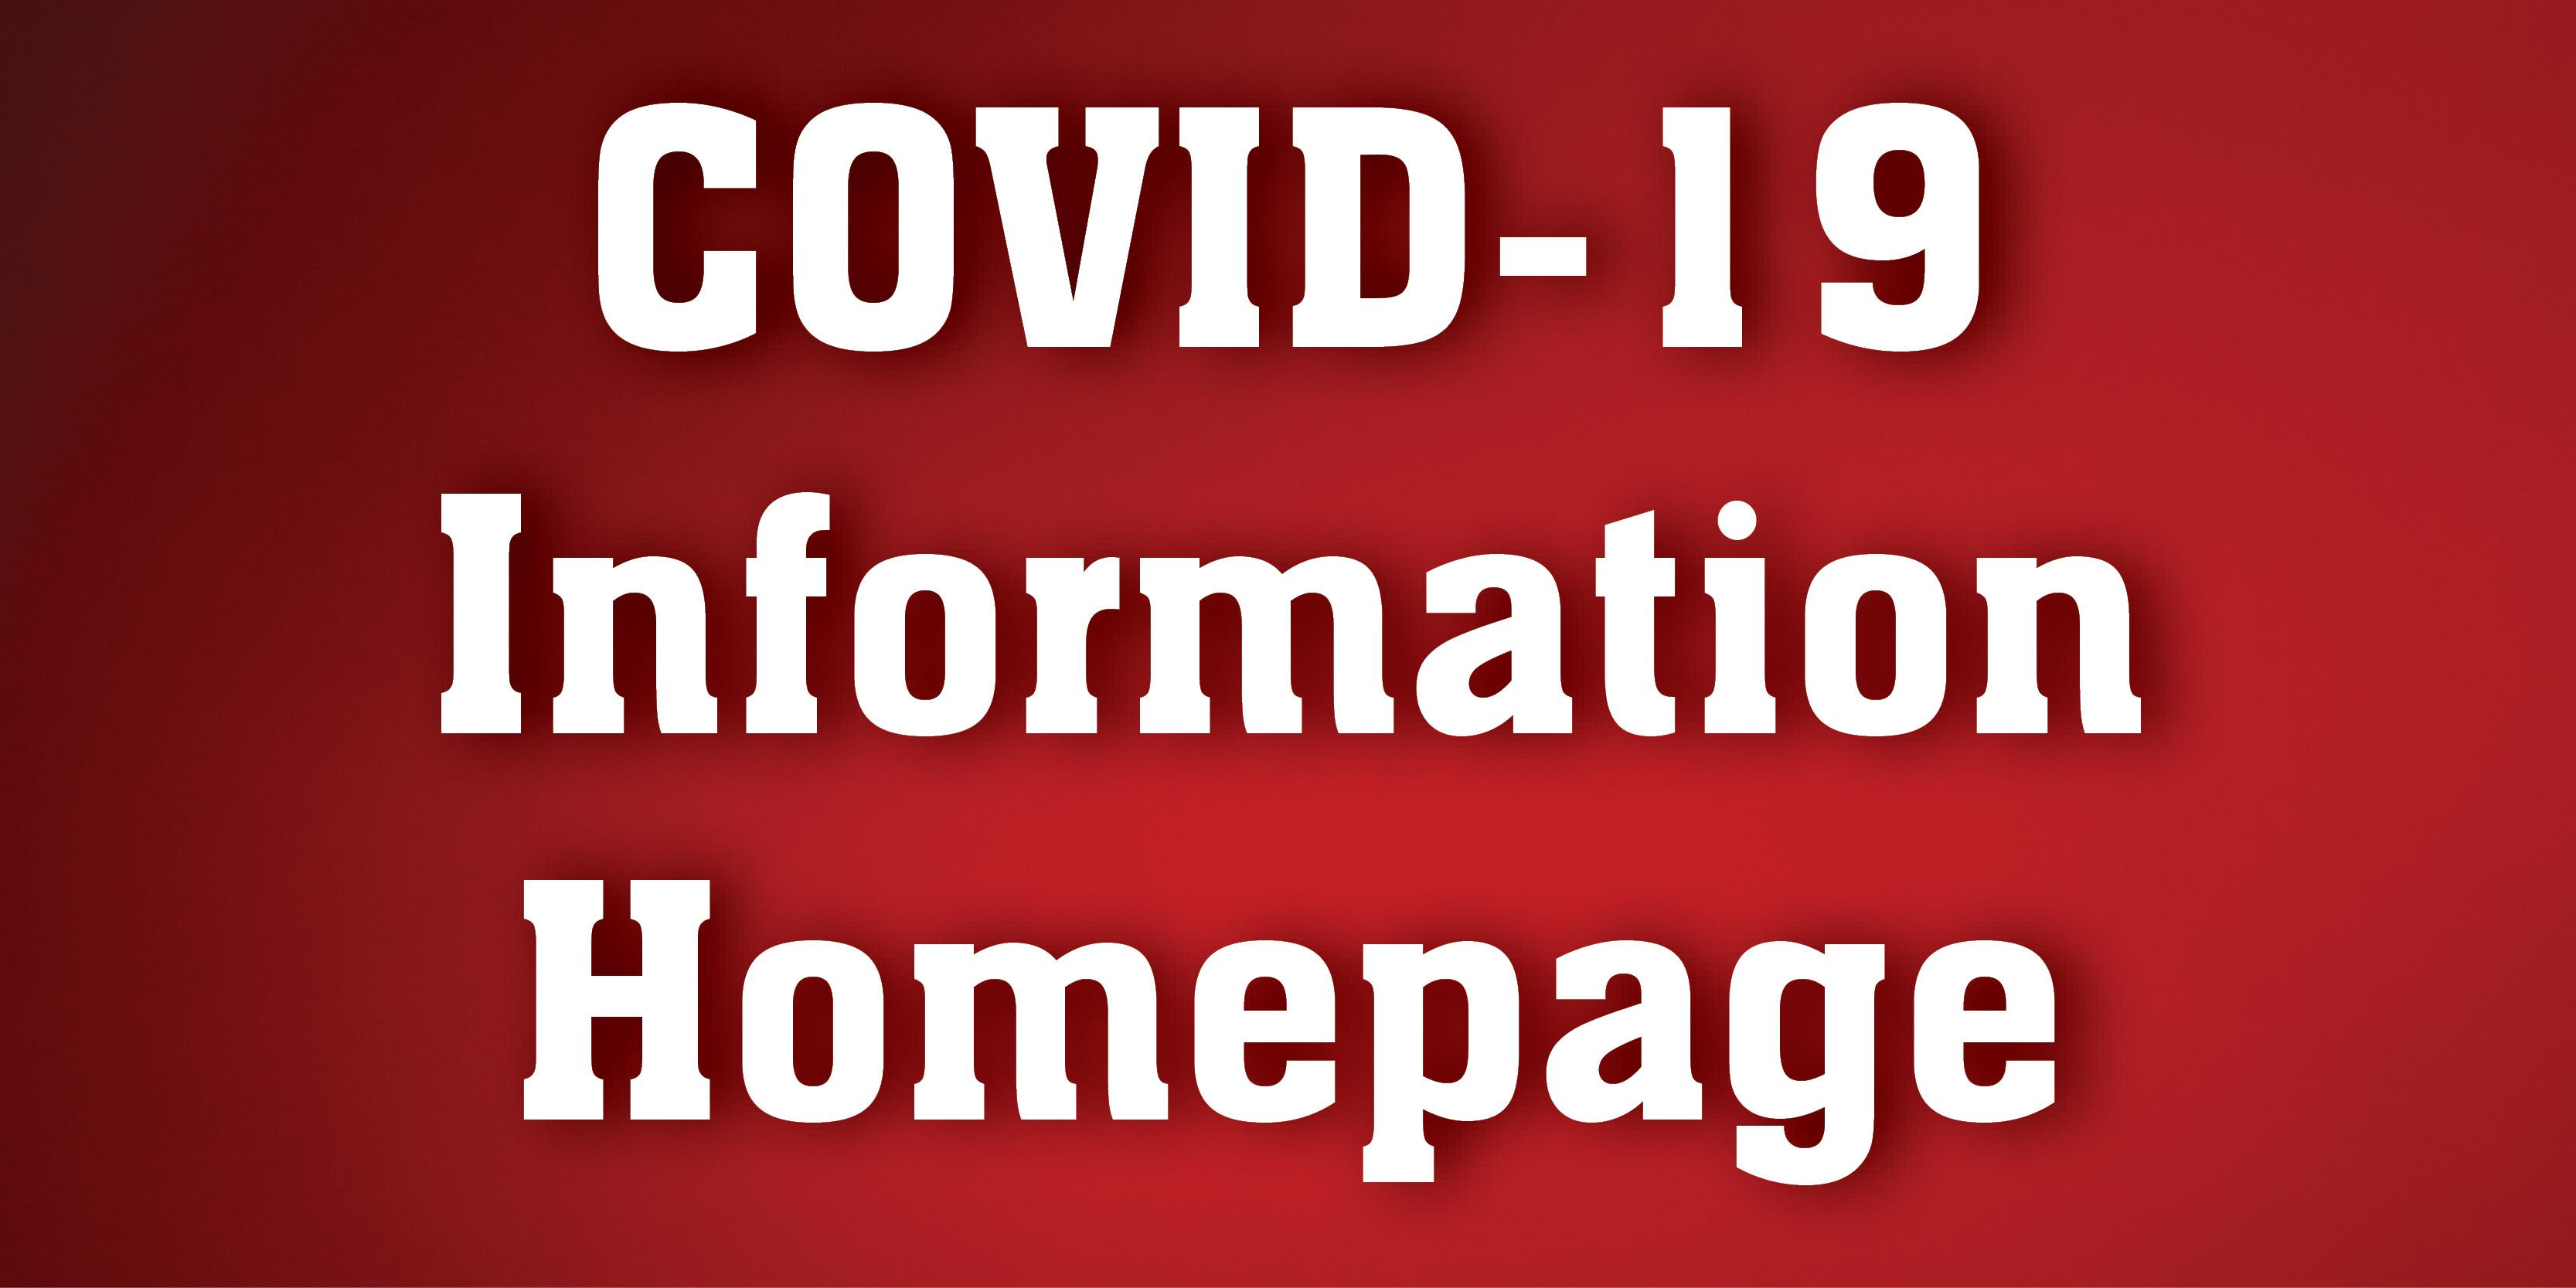 COVID-19 Information Homepage